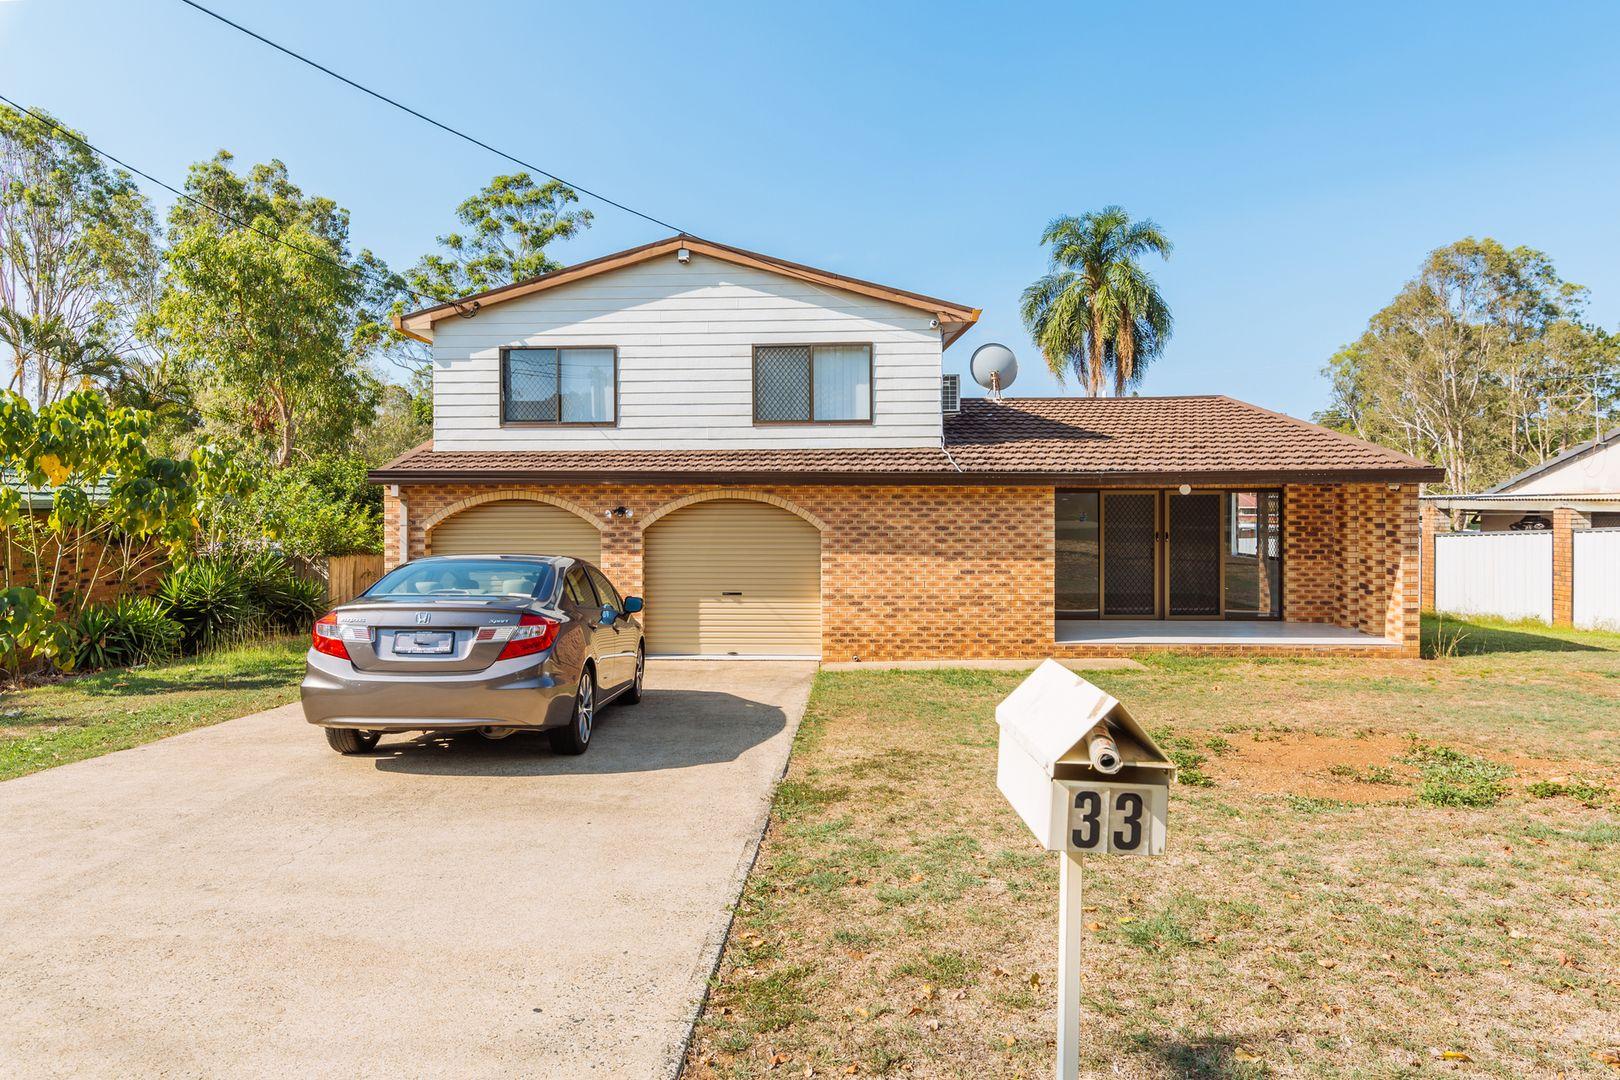 33 Lobelia Avenue, Daisy Hill QLD 4127, Image 0